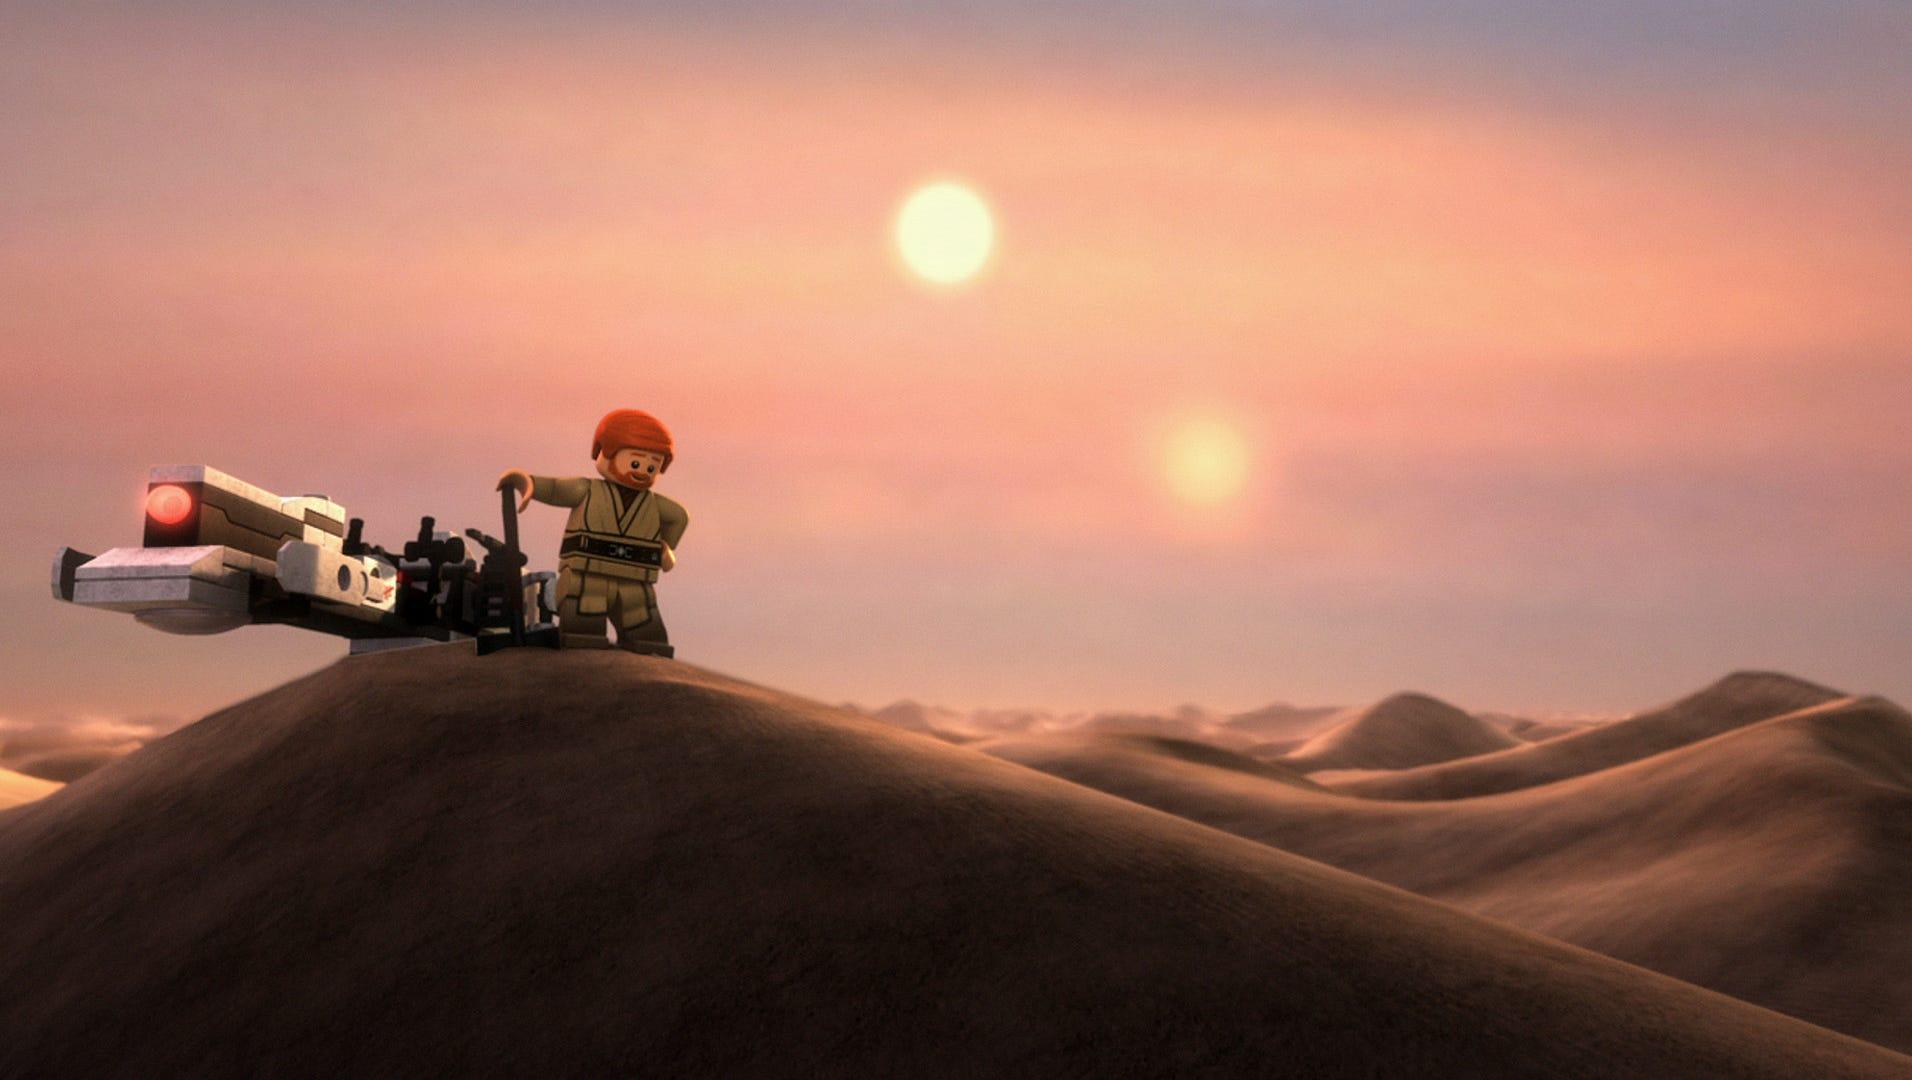 Lego Yoda Chronicles Builds On Star Wars Legacy